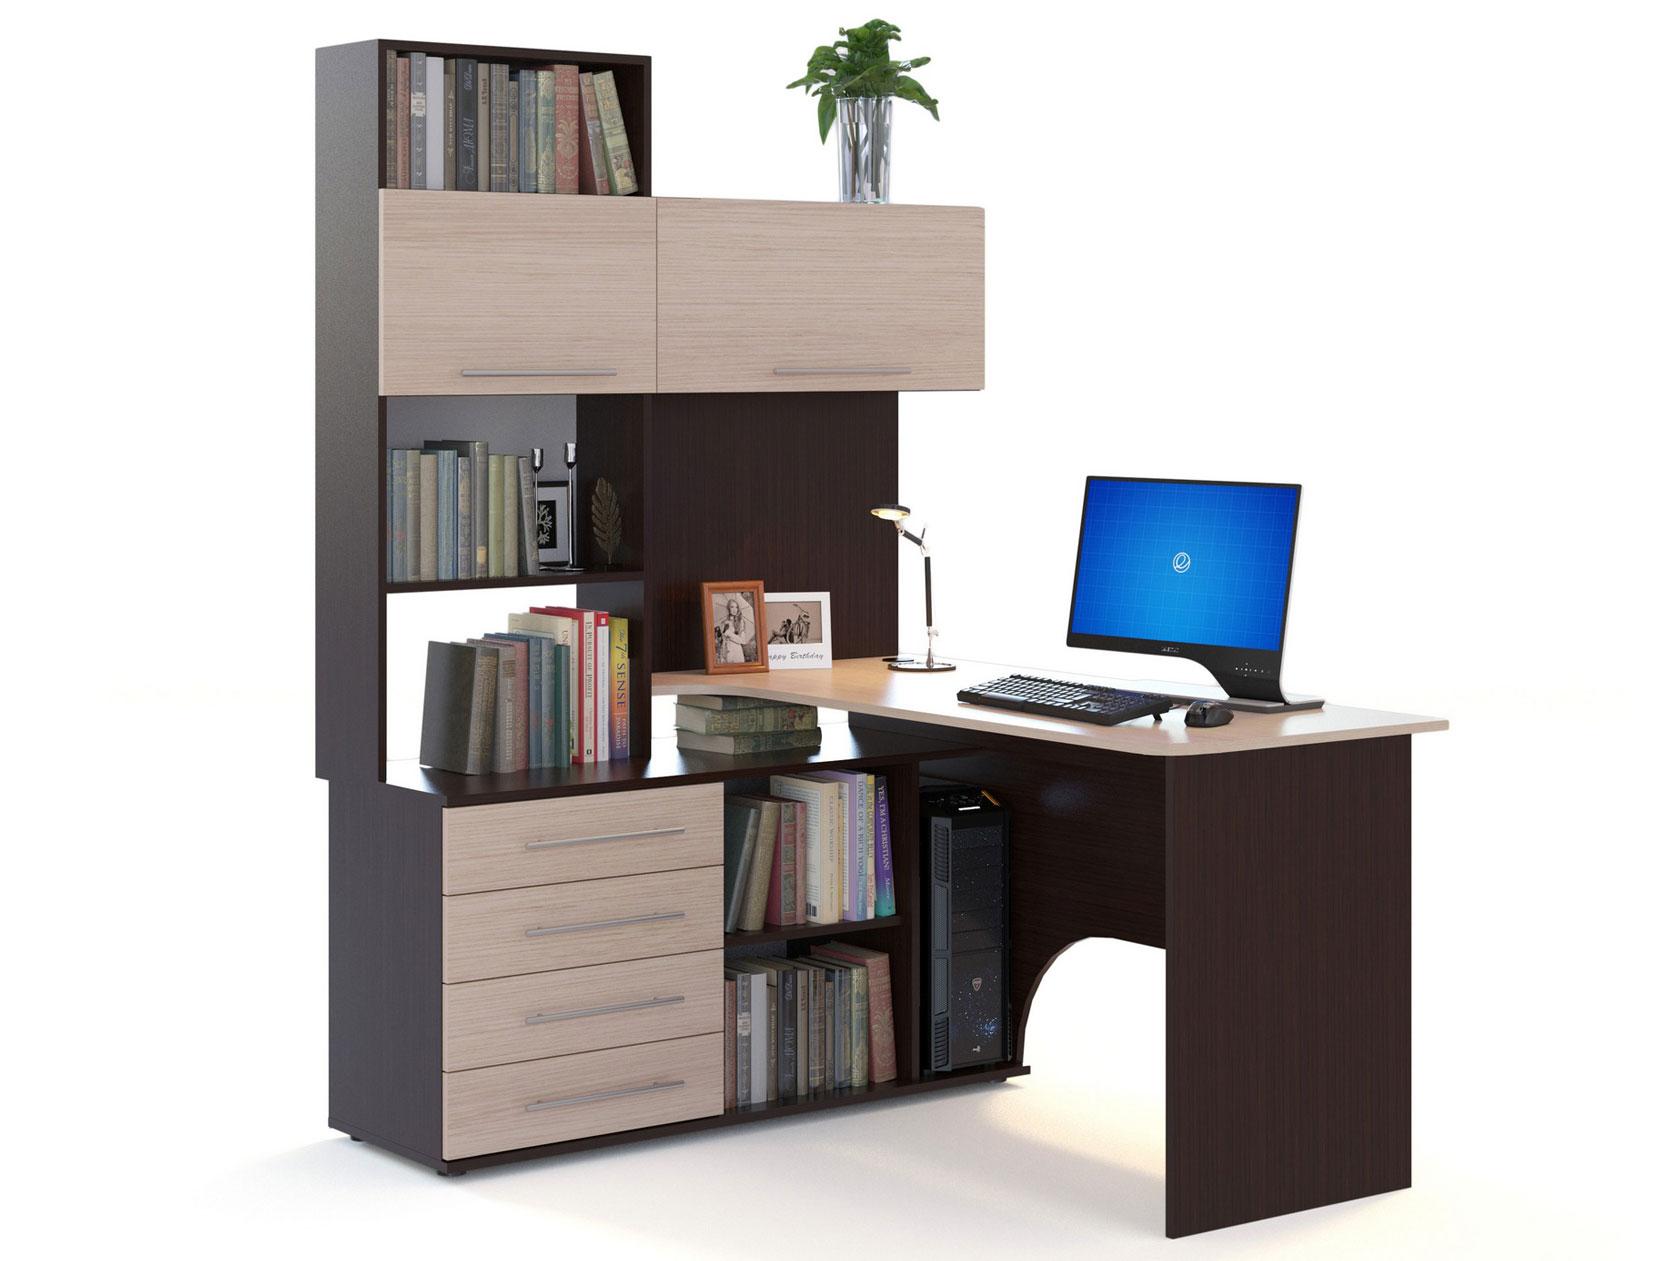 Компьютерный стол СОКОЛ КСТ-14 140x123,5x182,8, венге/беленый дуб